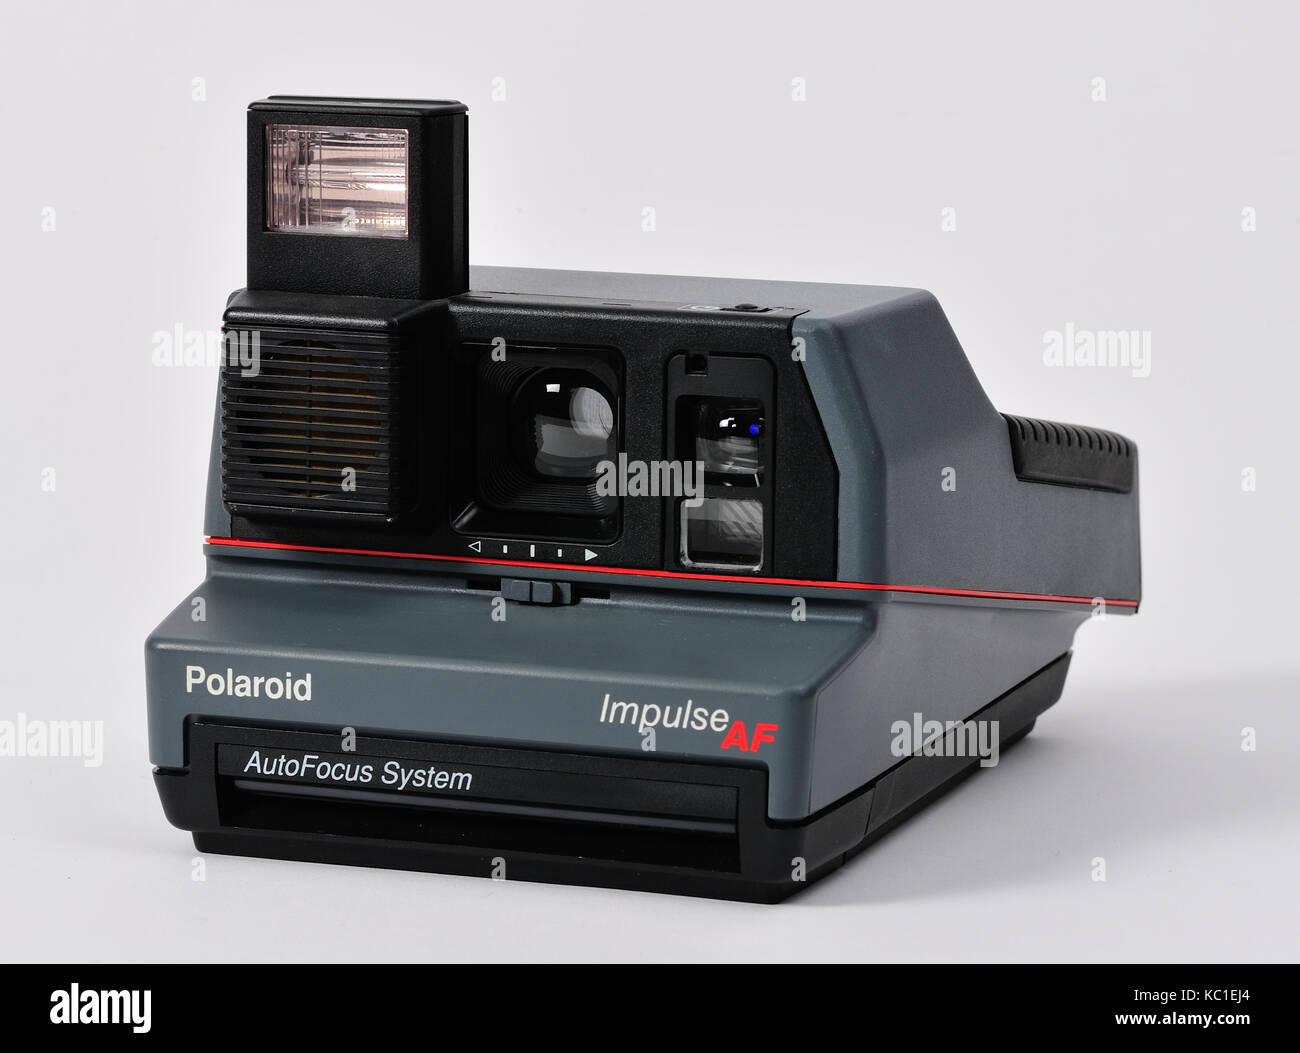 vintage polaroid land camera with instruction manual and box stock rh alamy com polaroid impulse instructions polaroid impulse instructions